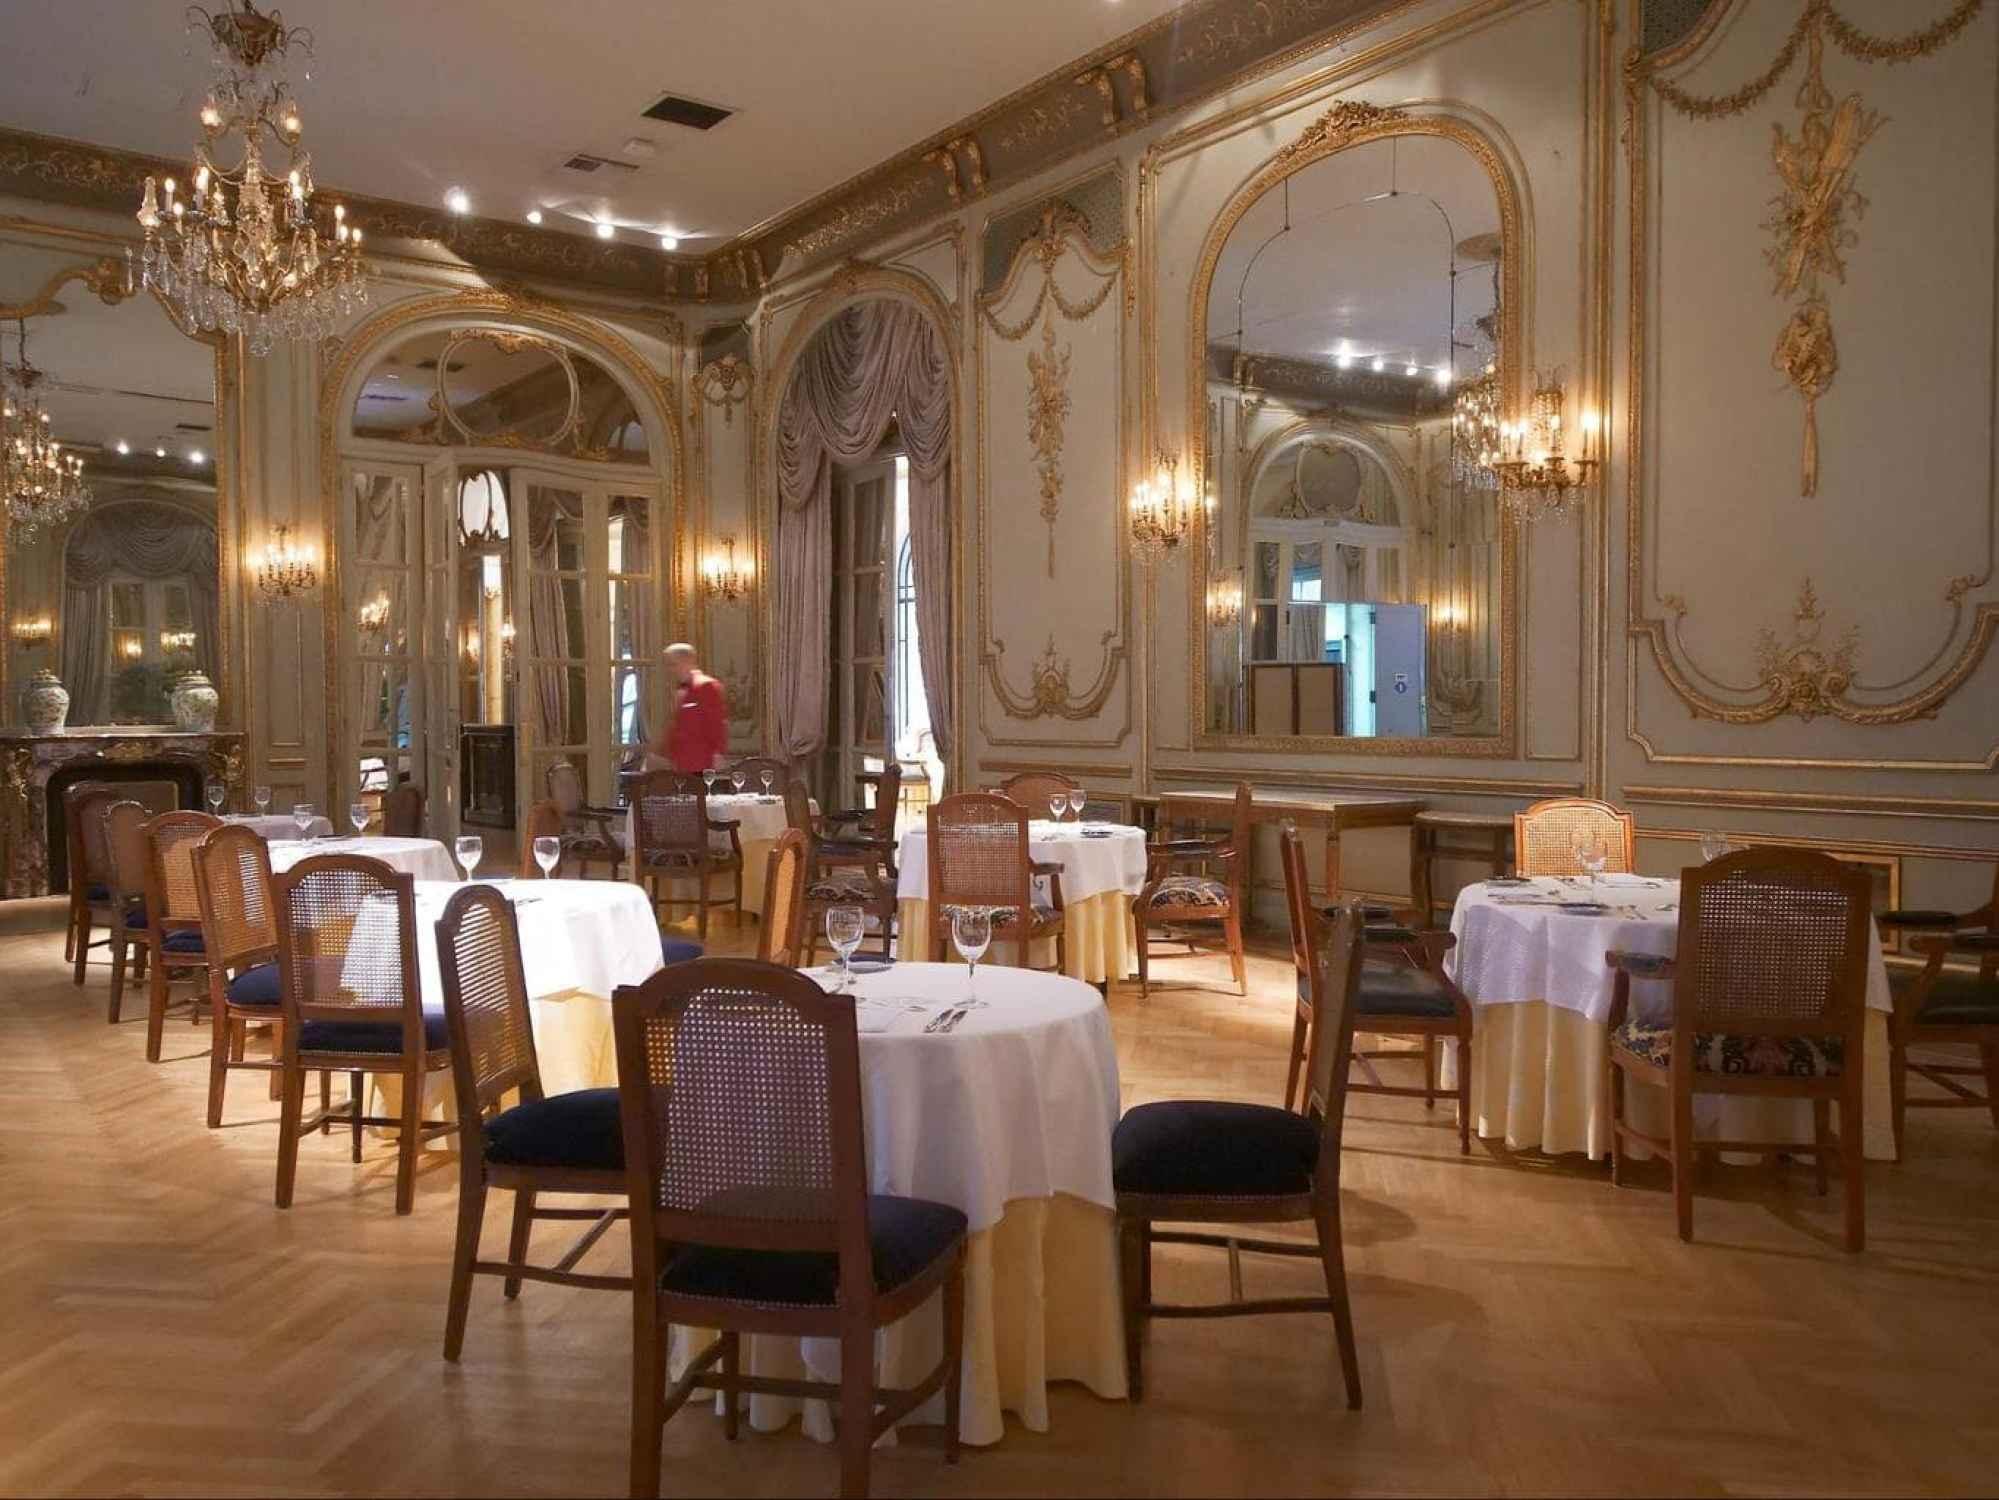 Alvear Palace dining